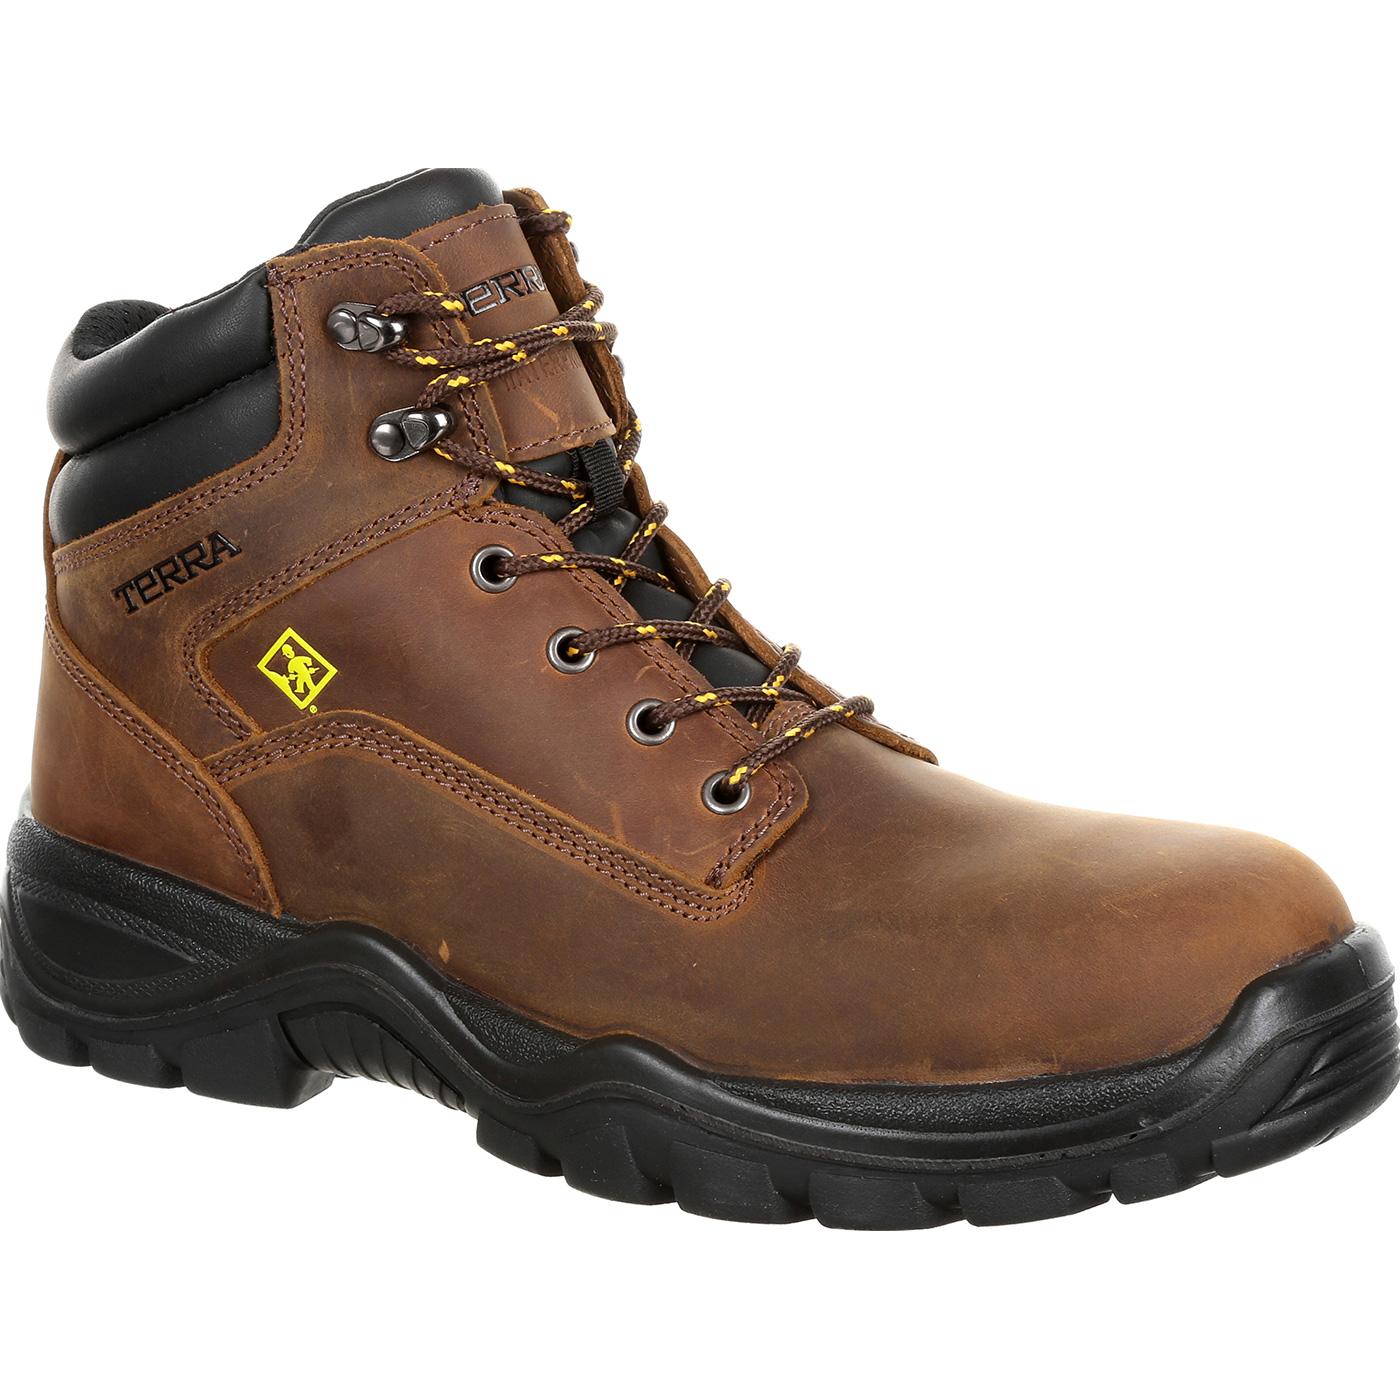 801a05a5271 Terra Grafton Men's CSA Composite Toe Puncture-Resistant Electrical Hazard  Waterproof Work Hikers